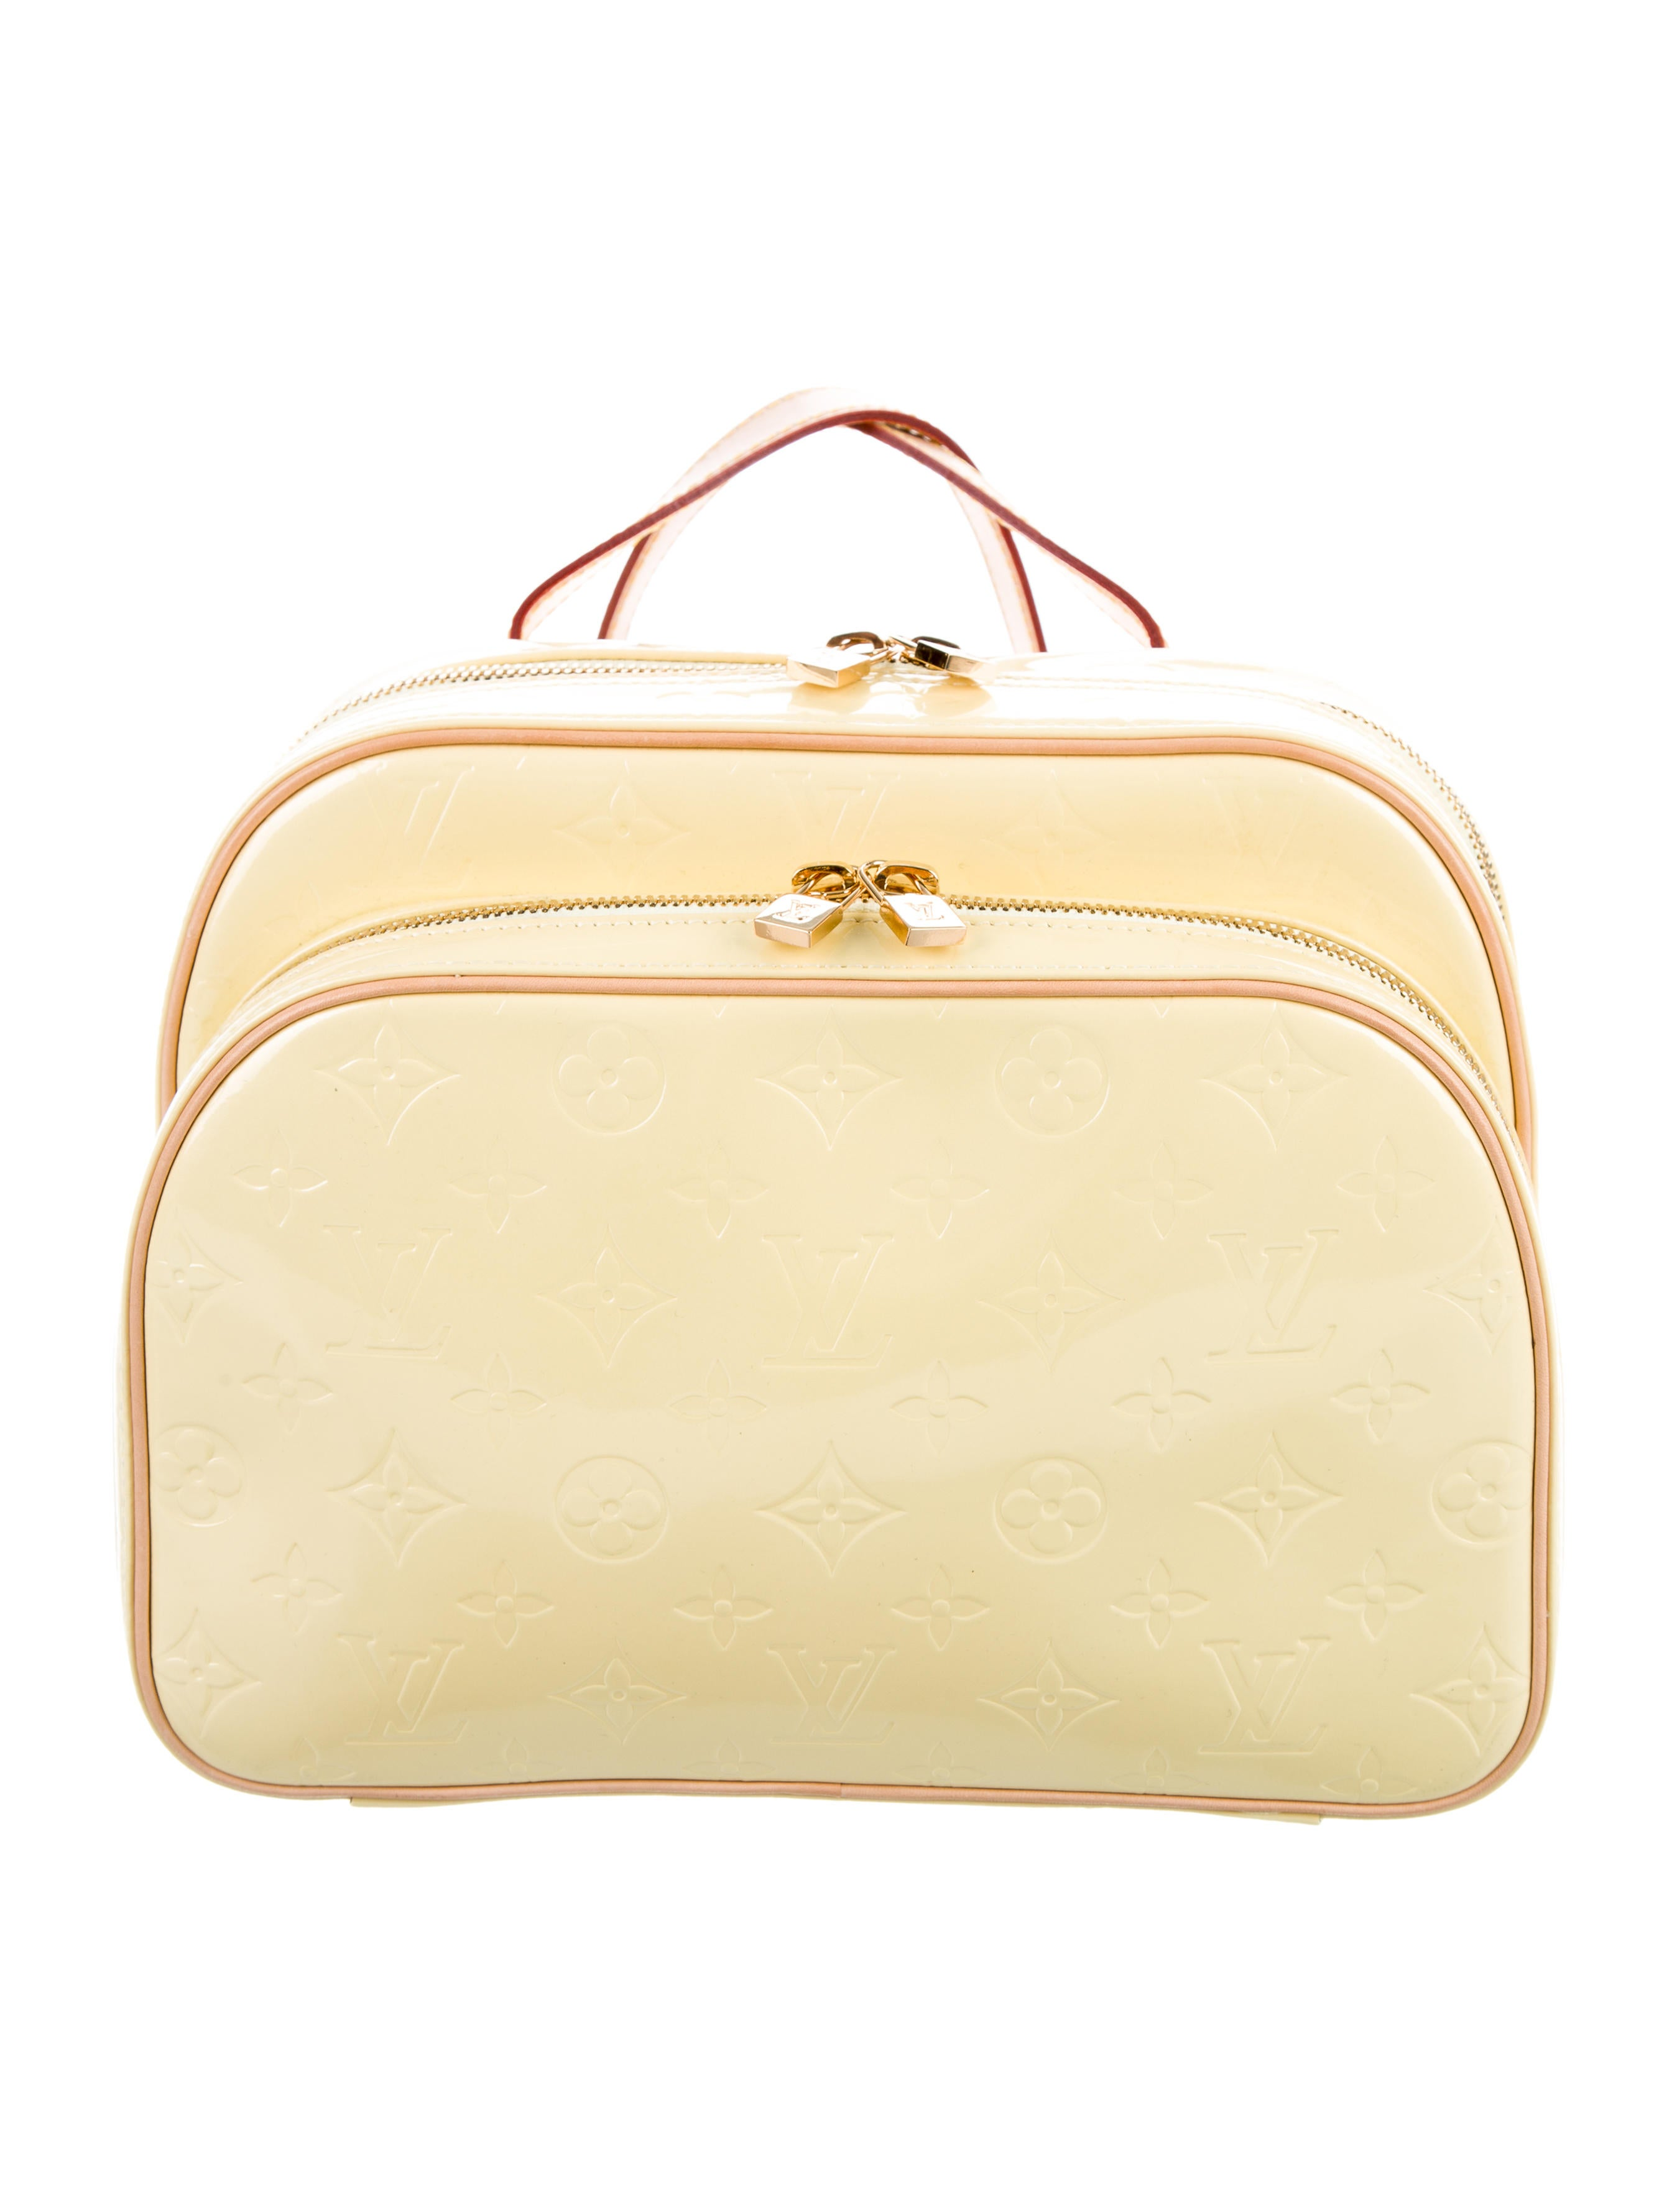 a84c5d381384 Louis Vuitton Vernis Murray Backpack - Handbags - LOU143335